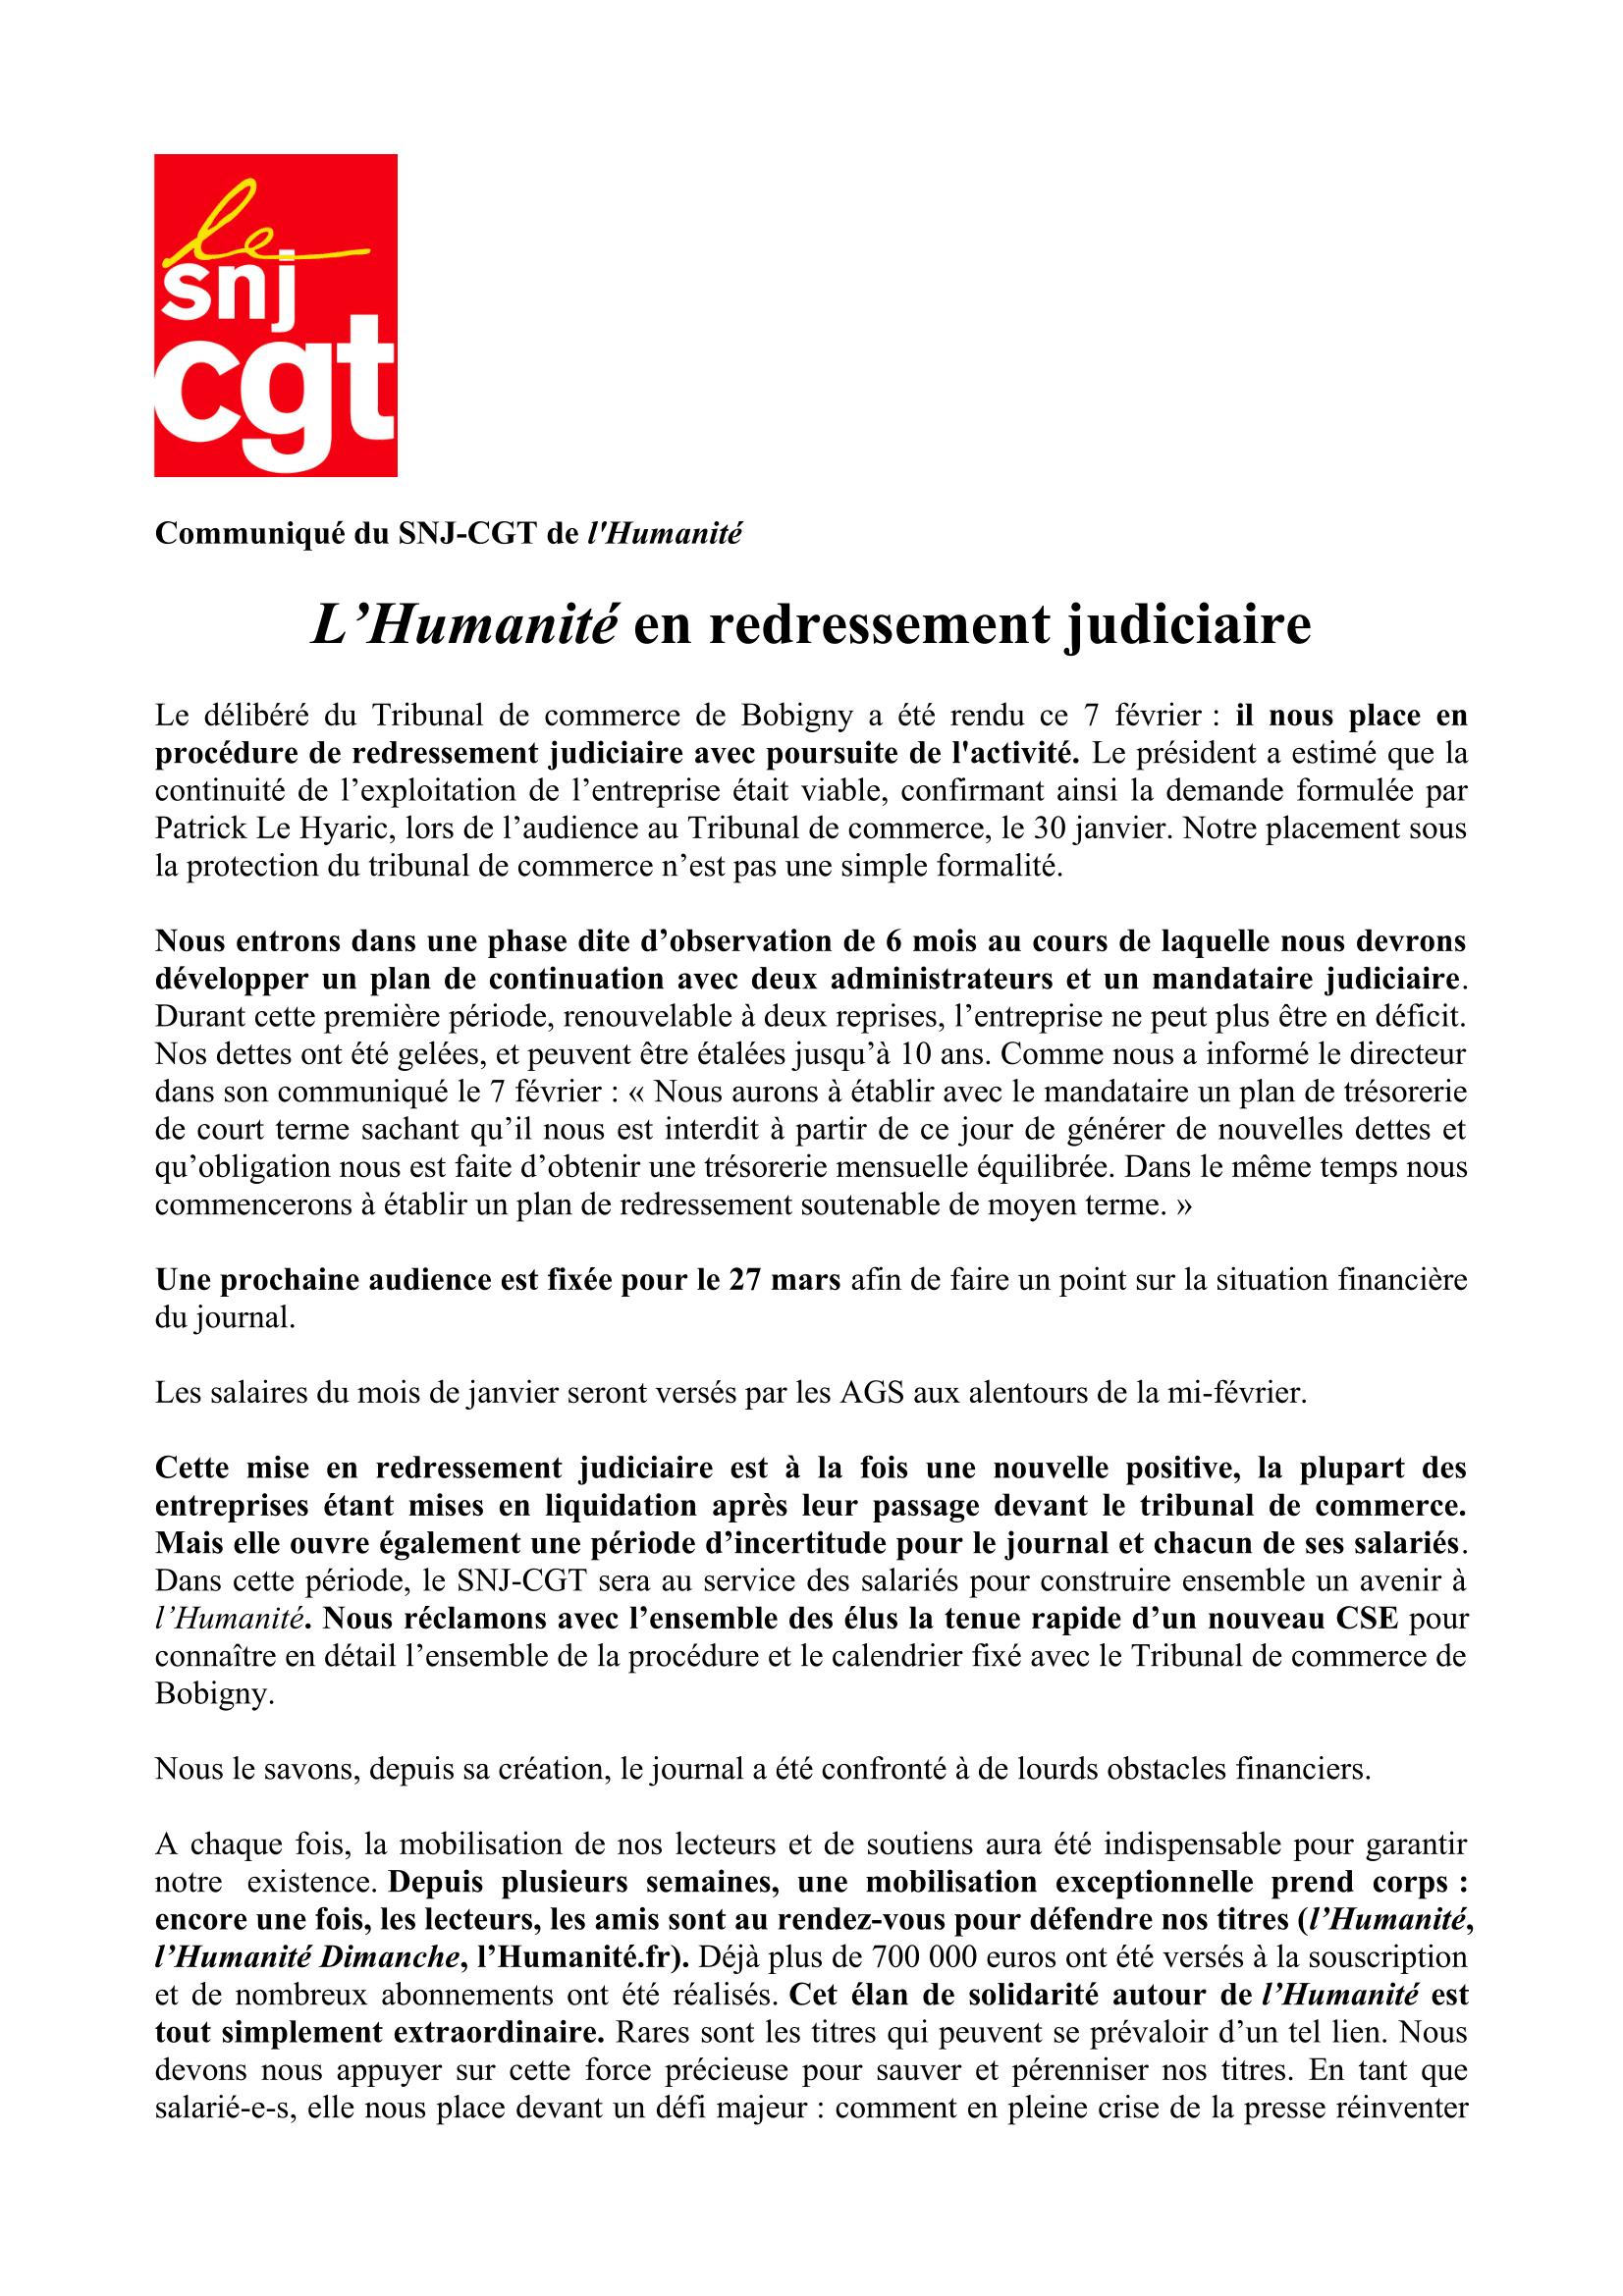 snj-cgt-l_humanite-en-redressement-7-fev-2019-1